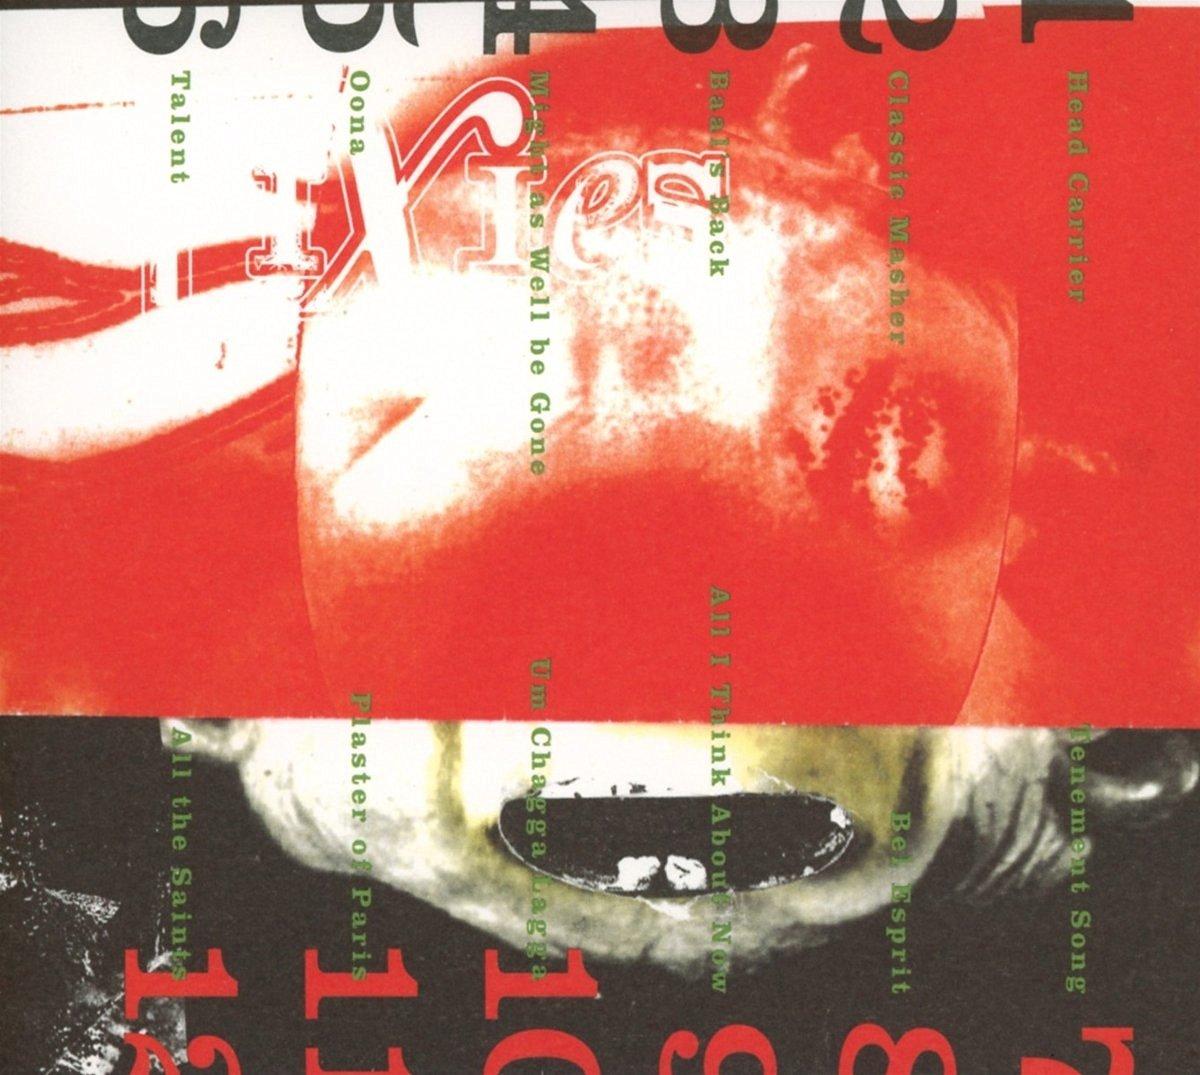 Pixies: Head Carrier [Ablum Review]